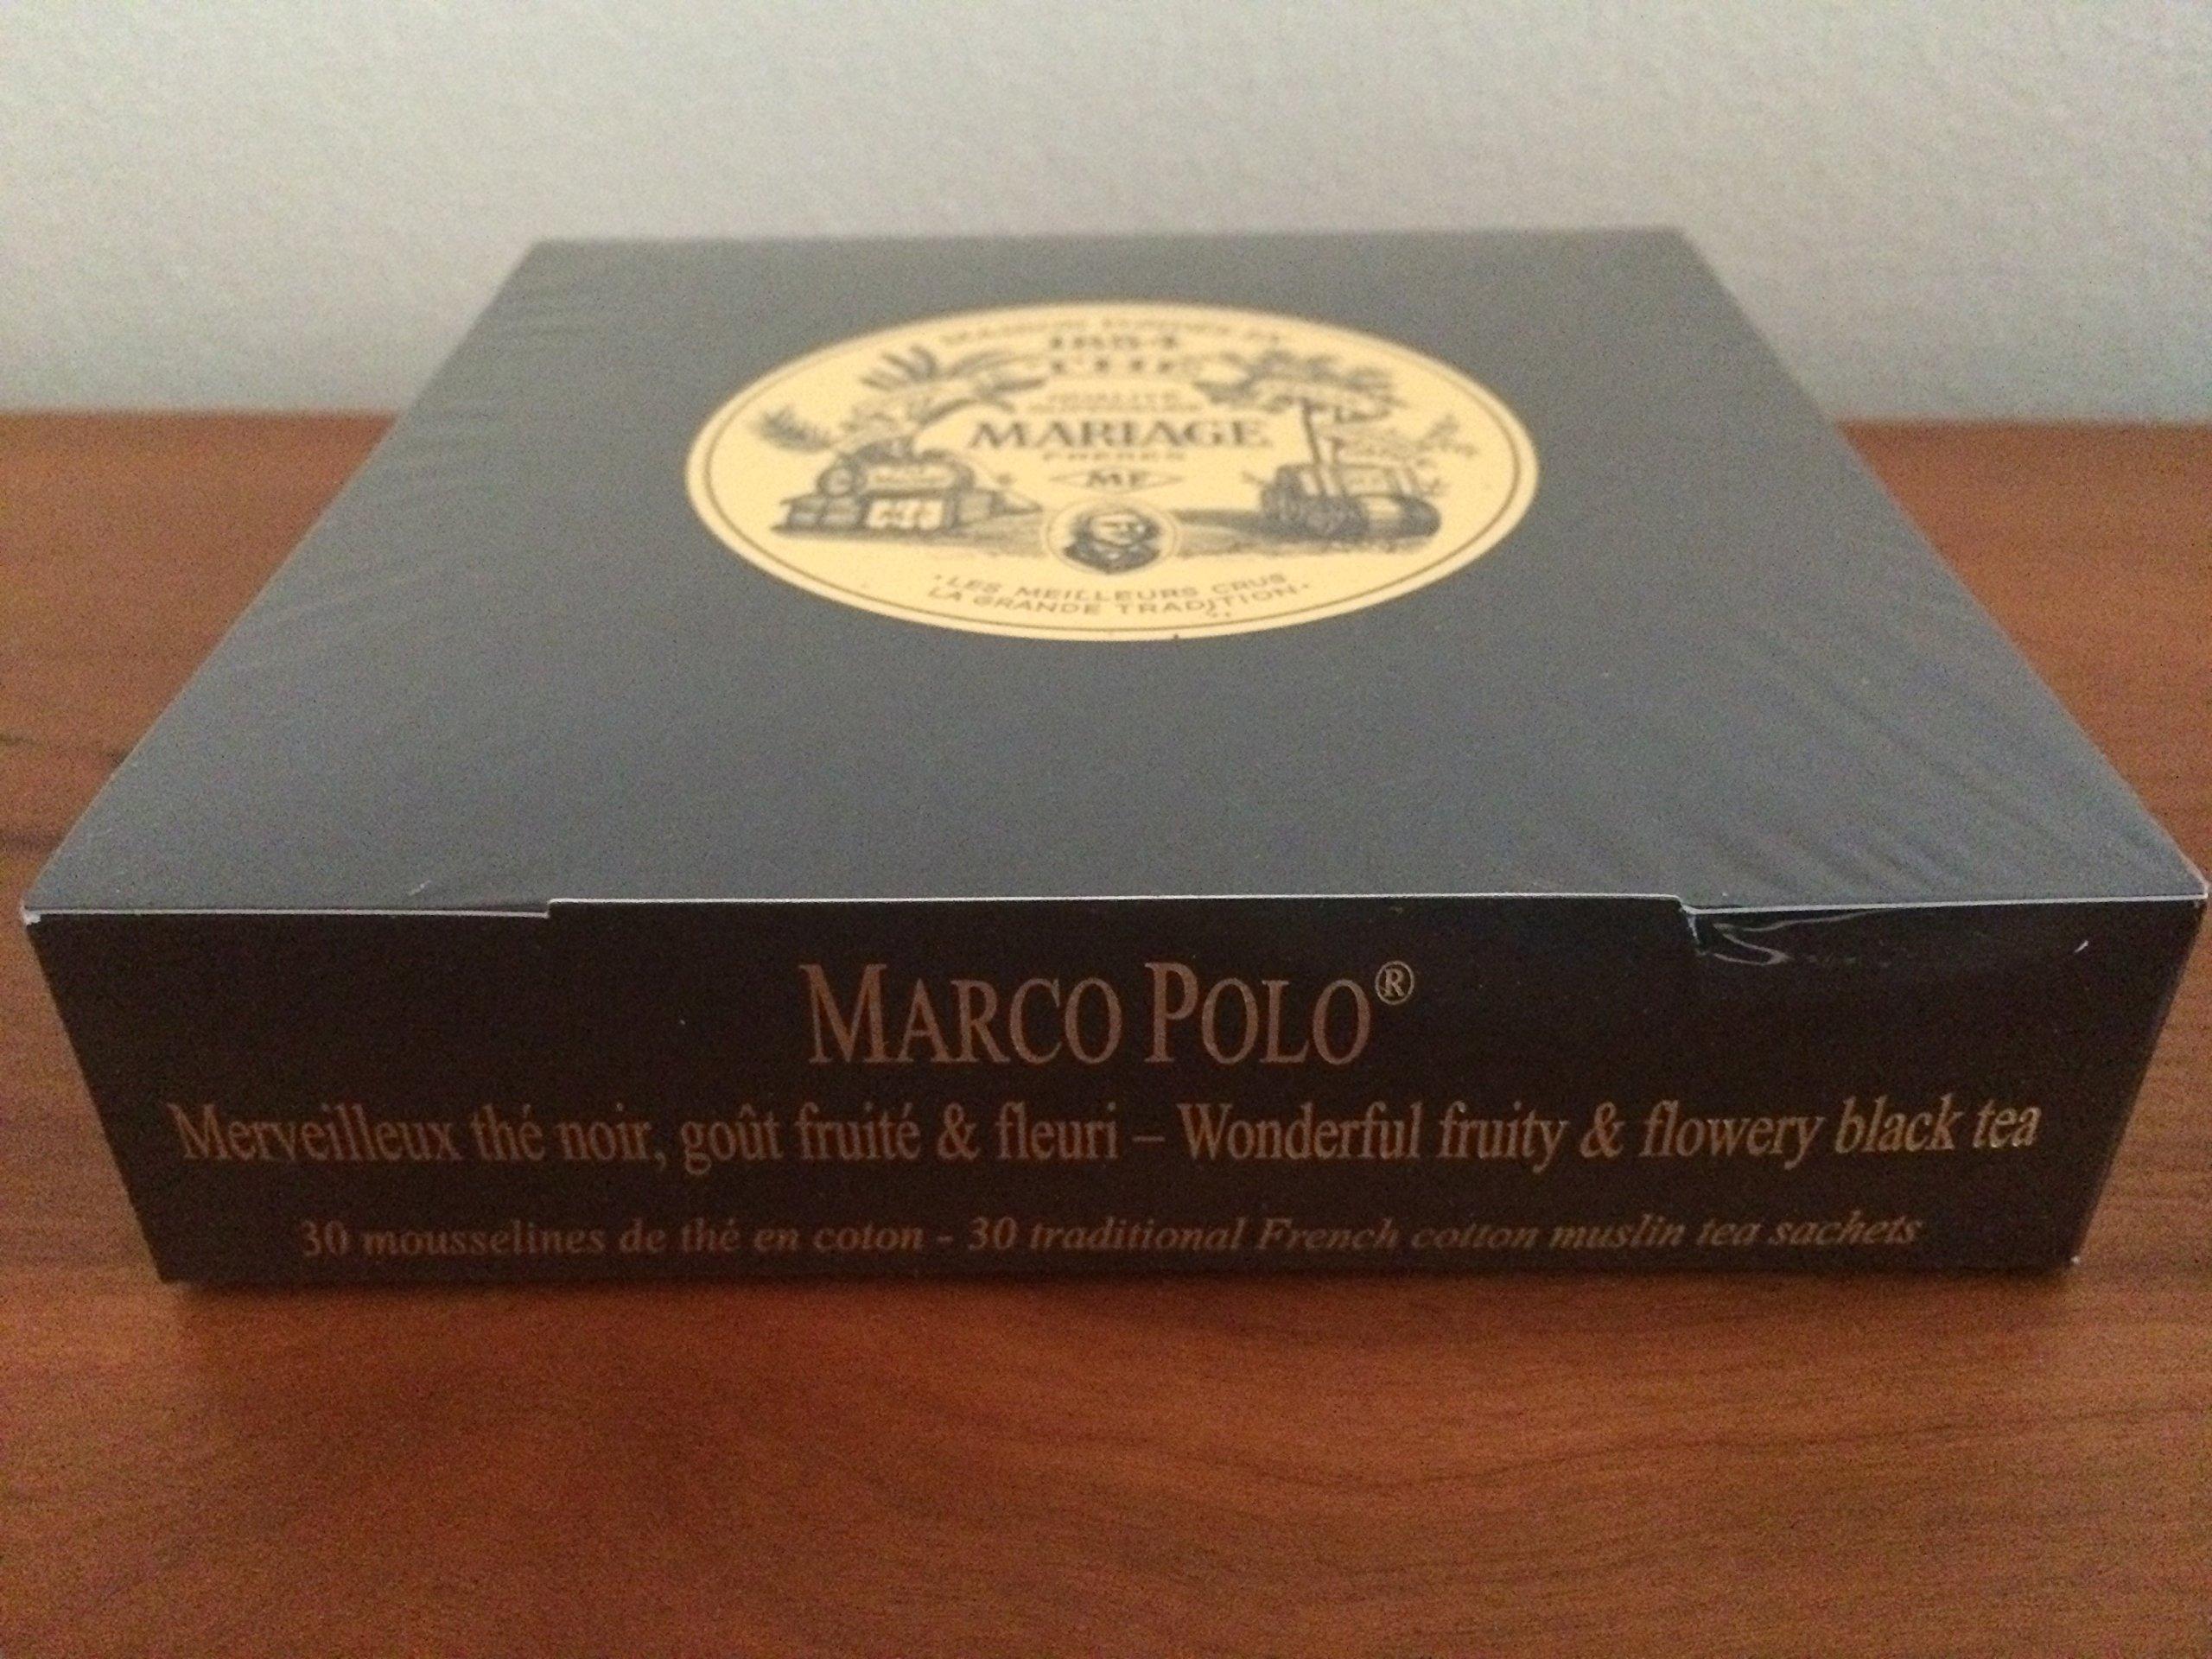 Mariage Freres - Marco Polo - Box of 30 Traditional Muslin Tea Sachets